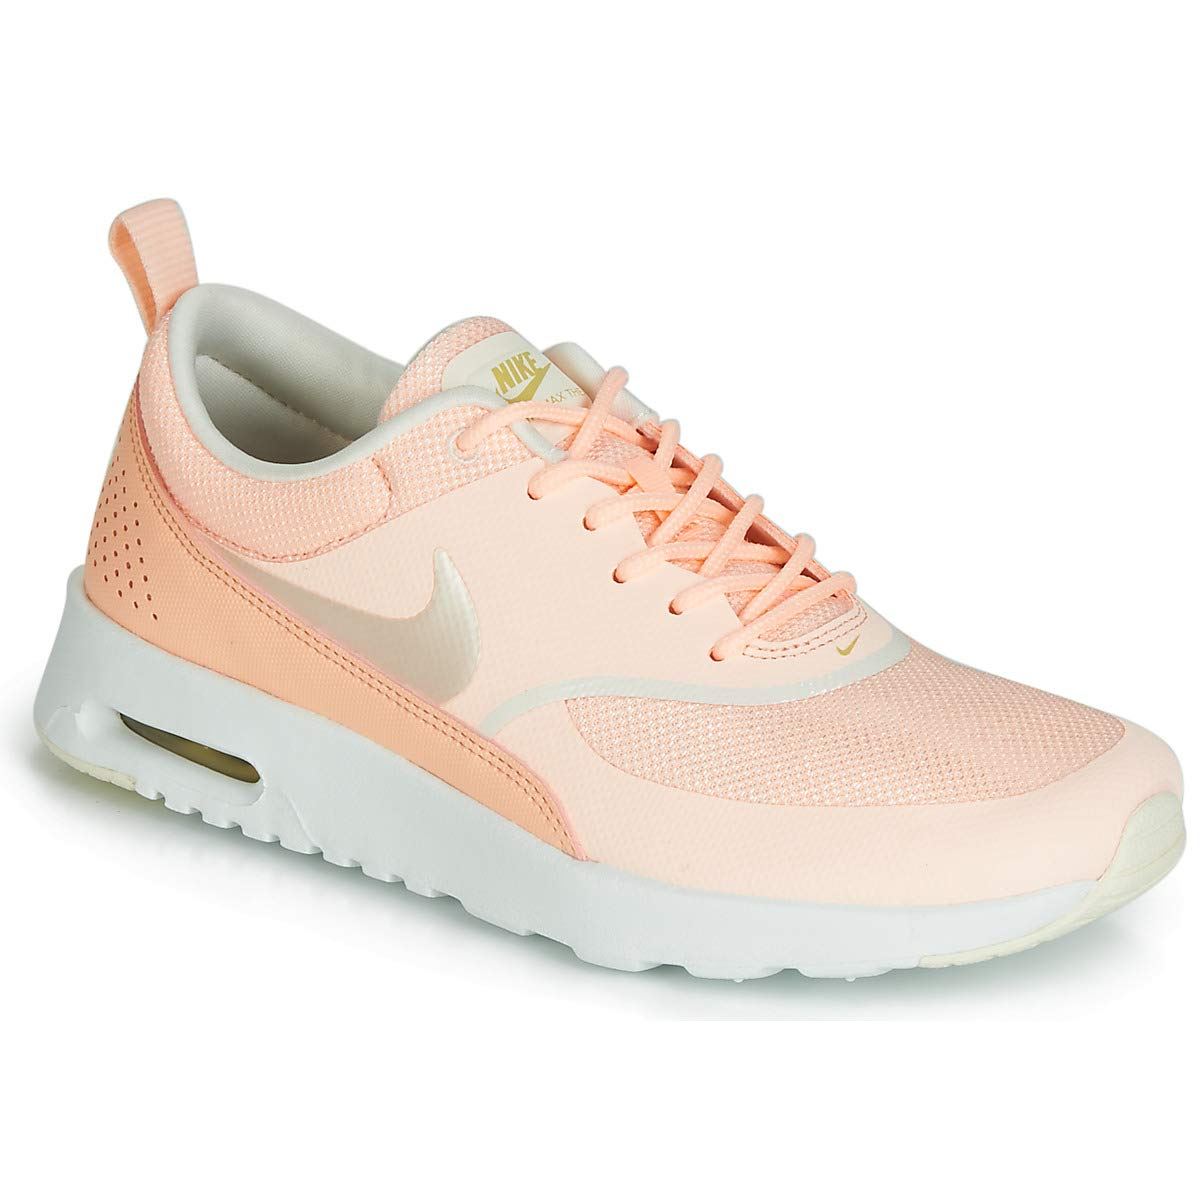 Nike Damen WMNS WMNS WMNS Air Max Thea Fitnessschuhe 62126b